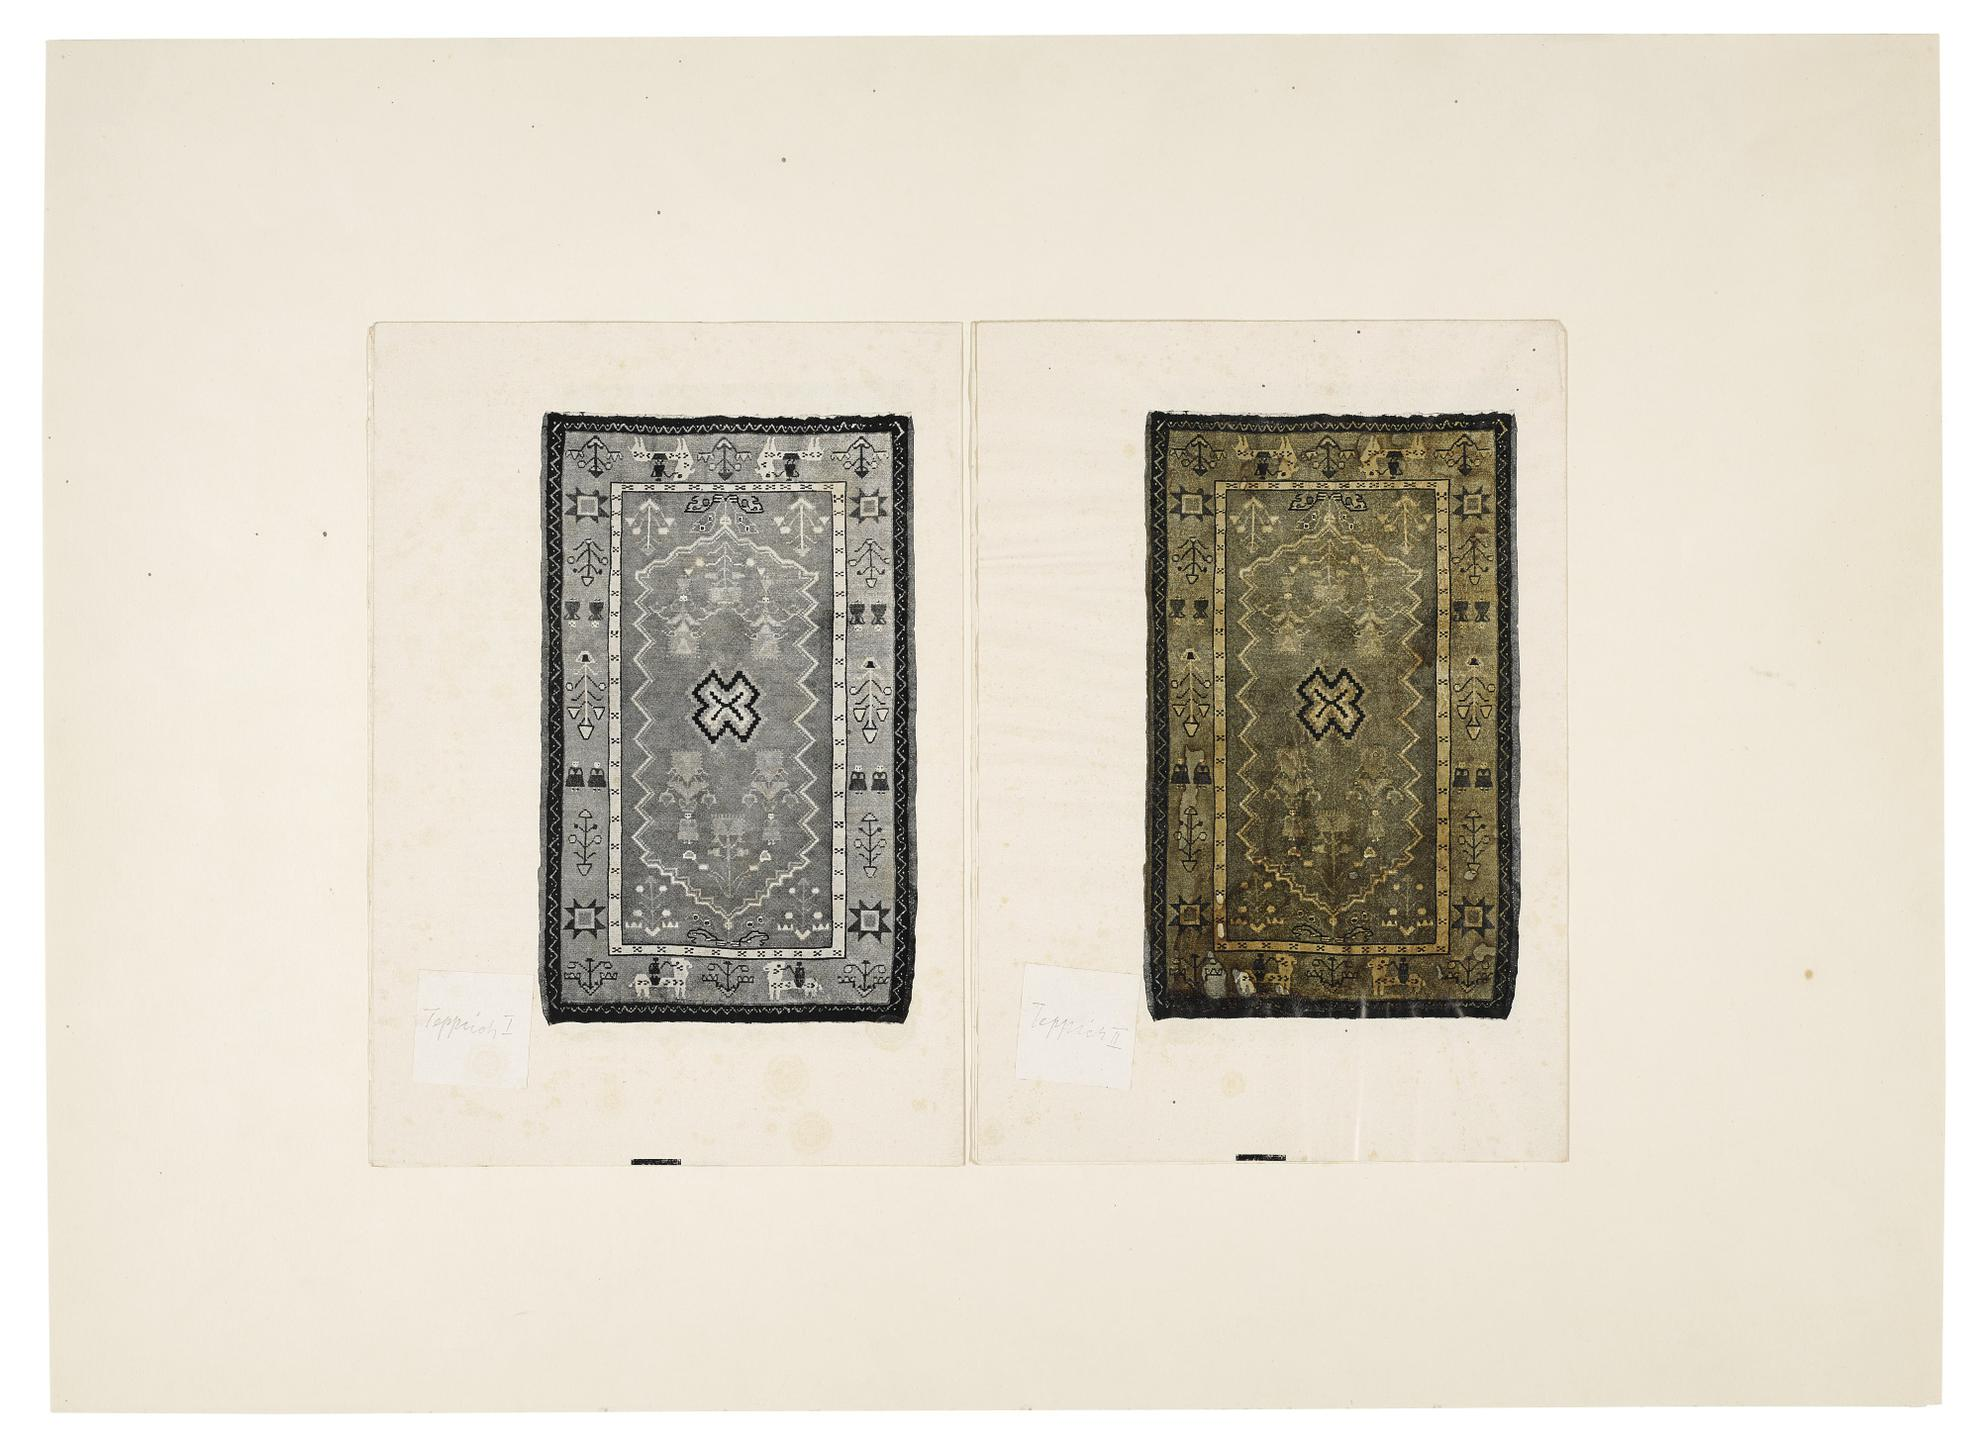 Joseph Beuys-Teppich I / Teppich Ii (Teppich Ii Mit Hasenblut)-1961